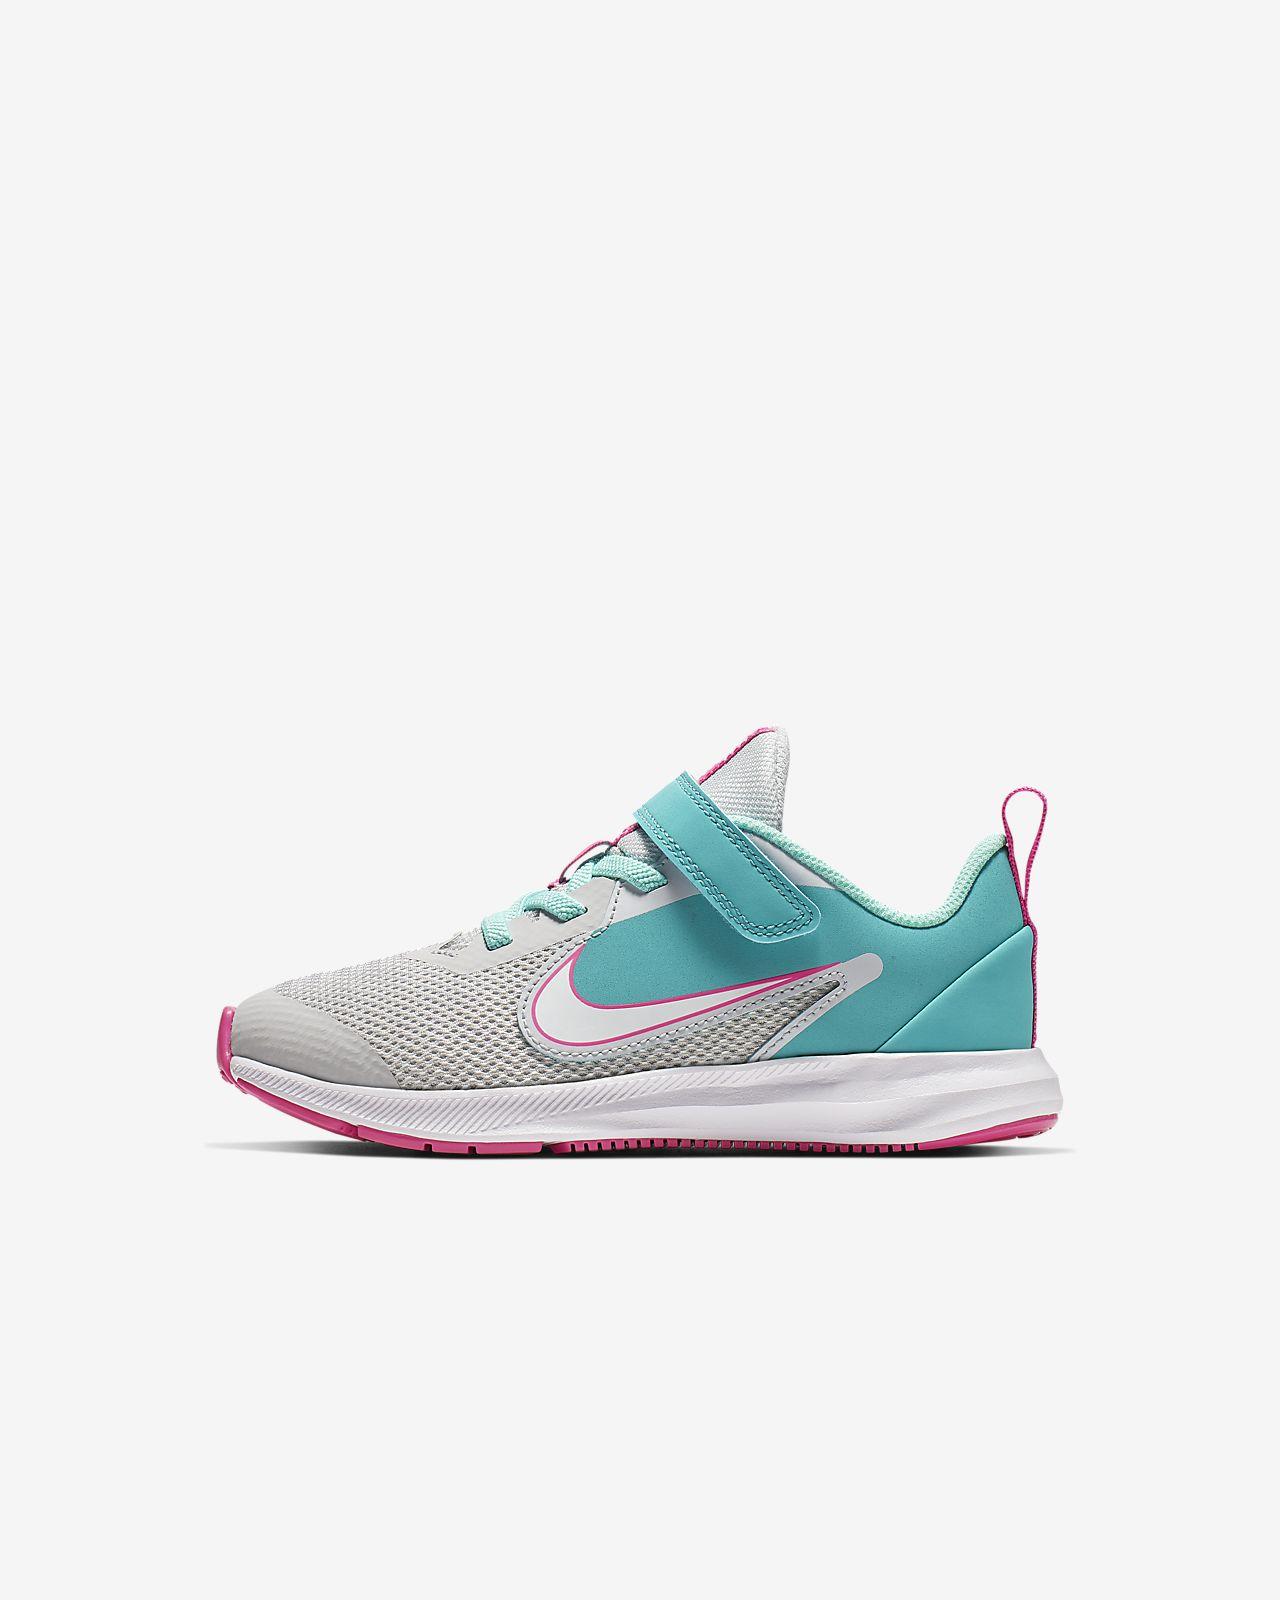 Nike Downshifter 9 Aqua Little Kids' Shoe